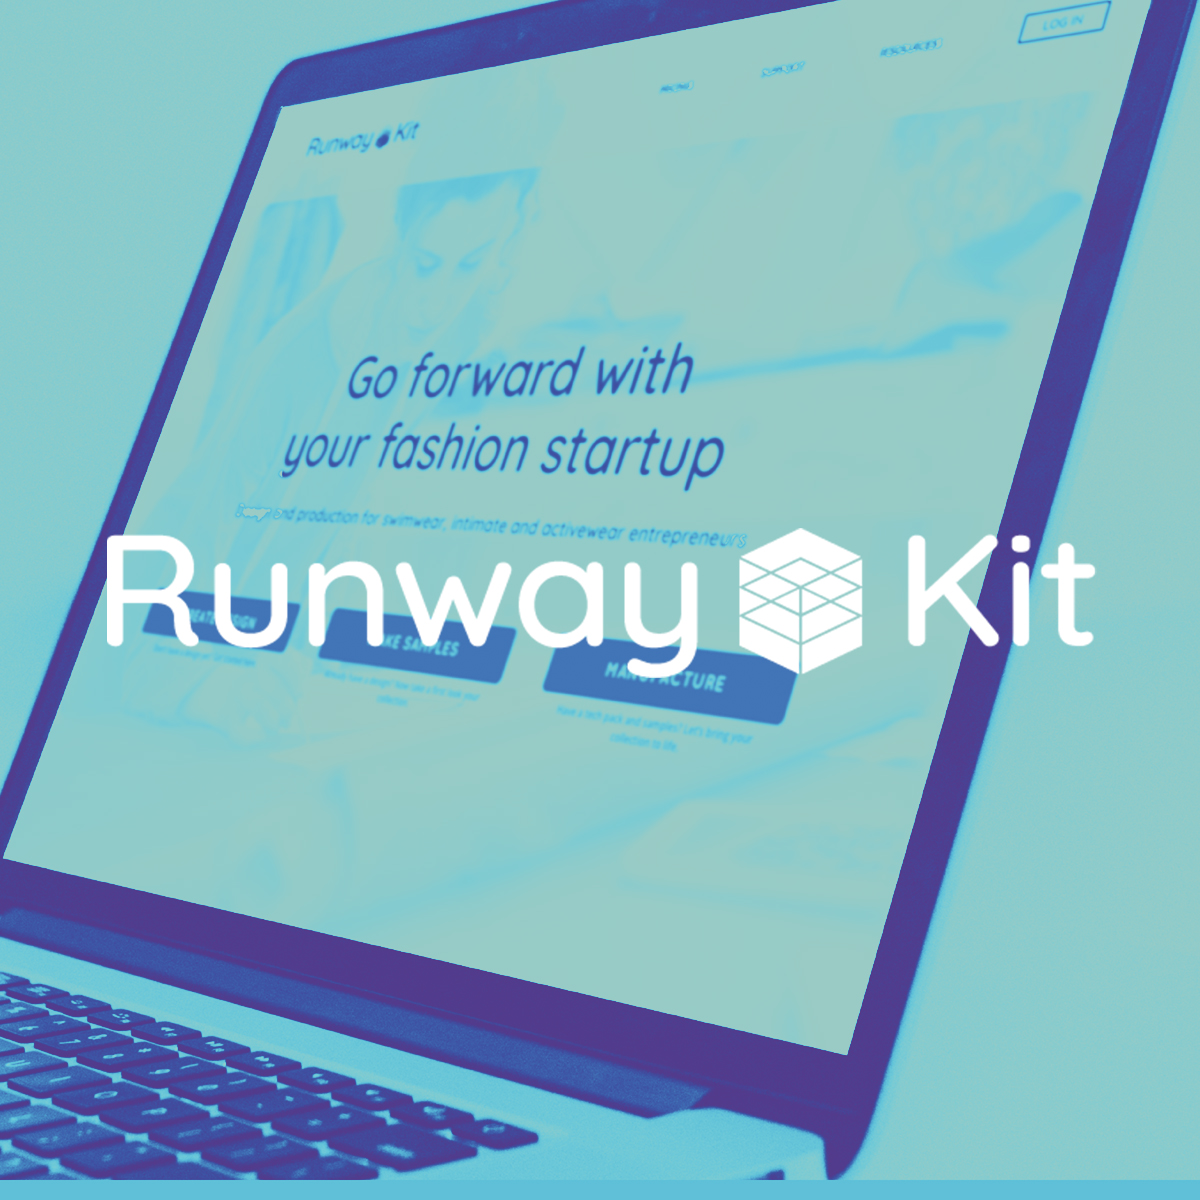 optimizing apparel manufacturing - Runway Kit - SAAS Desktop